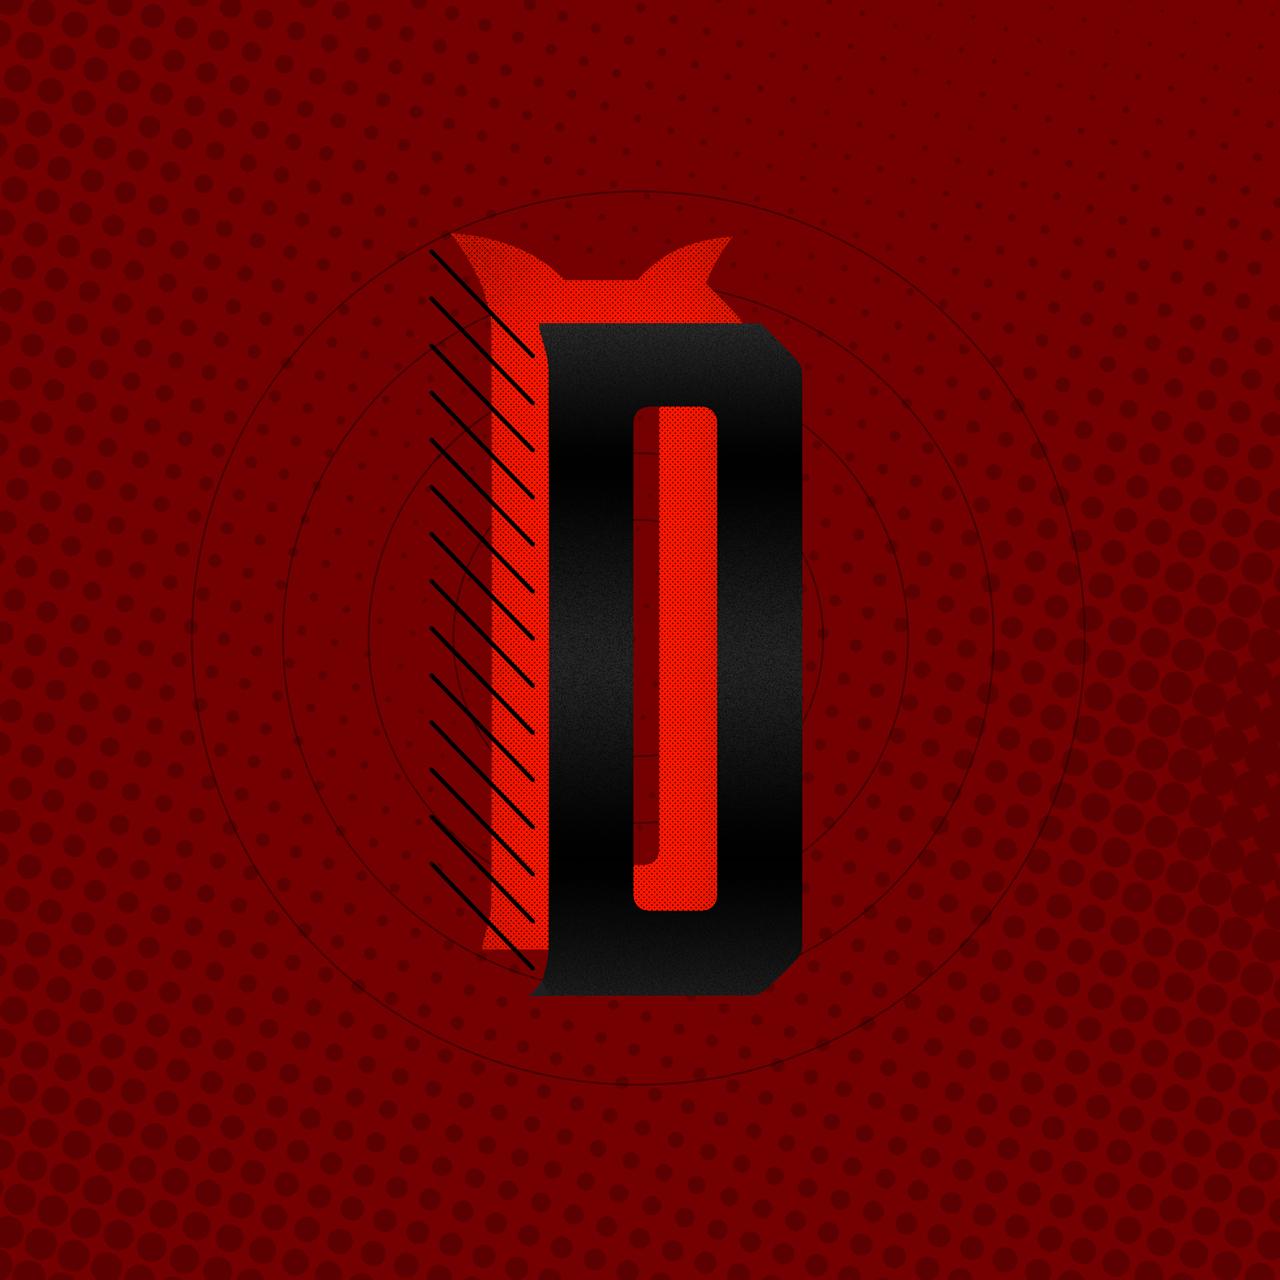 D-daredevil.png